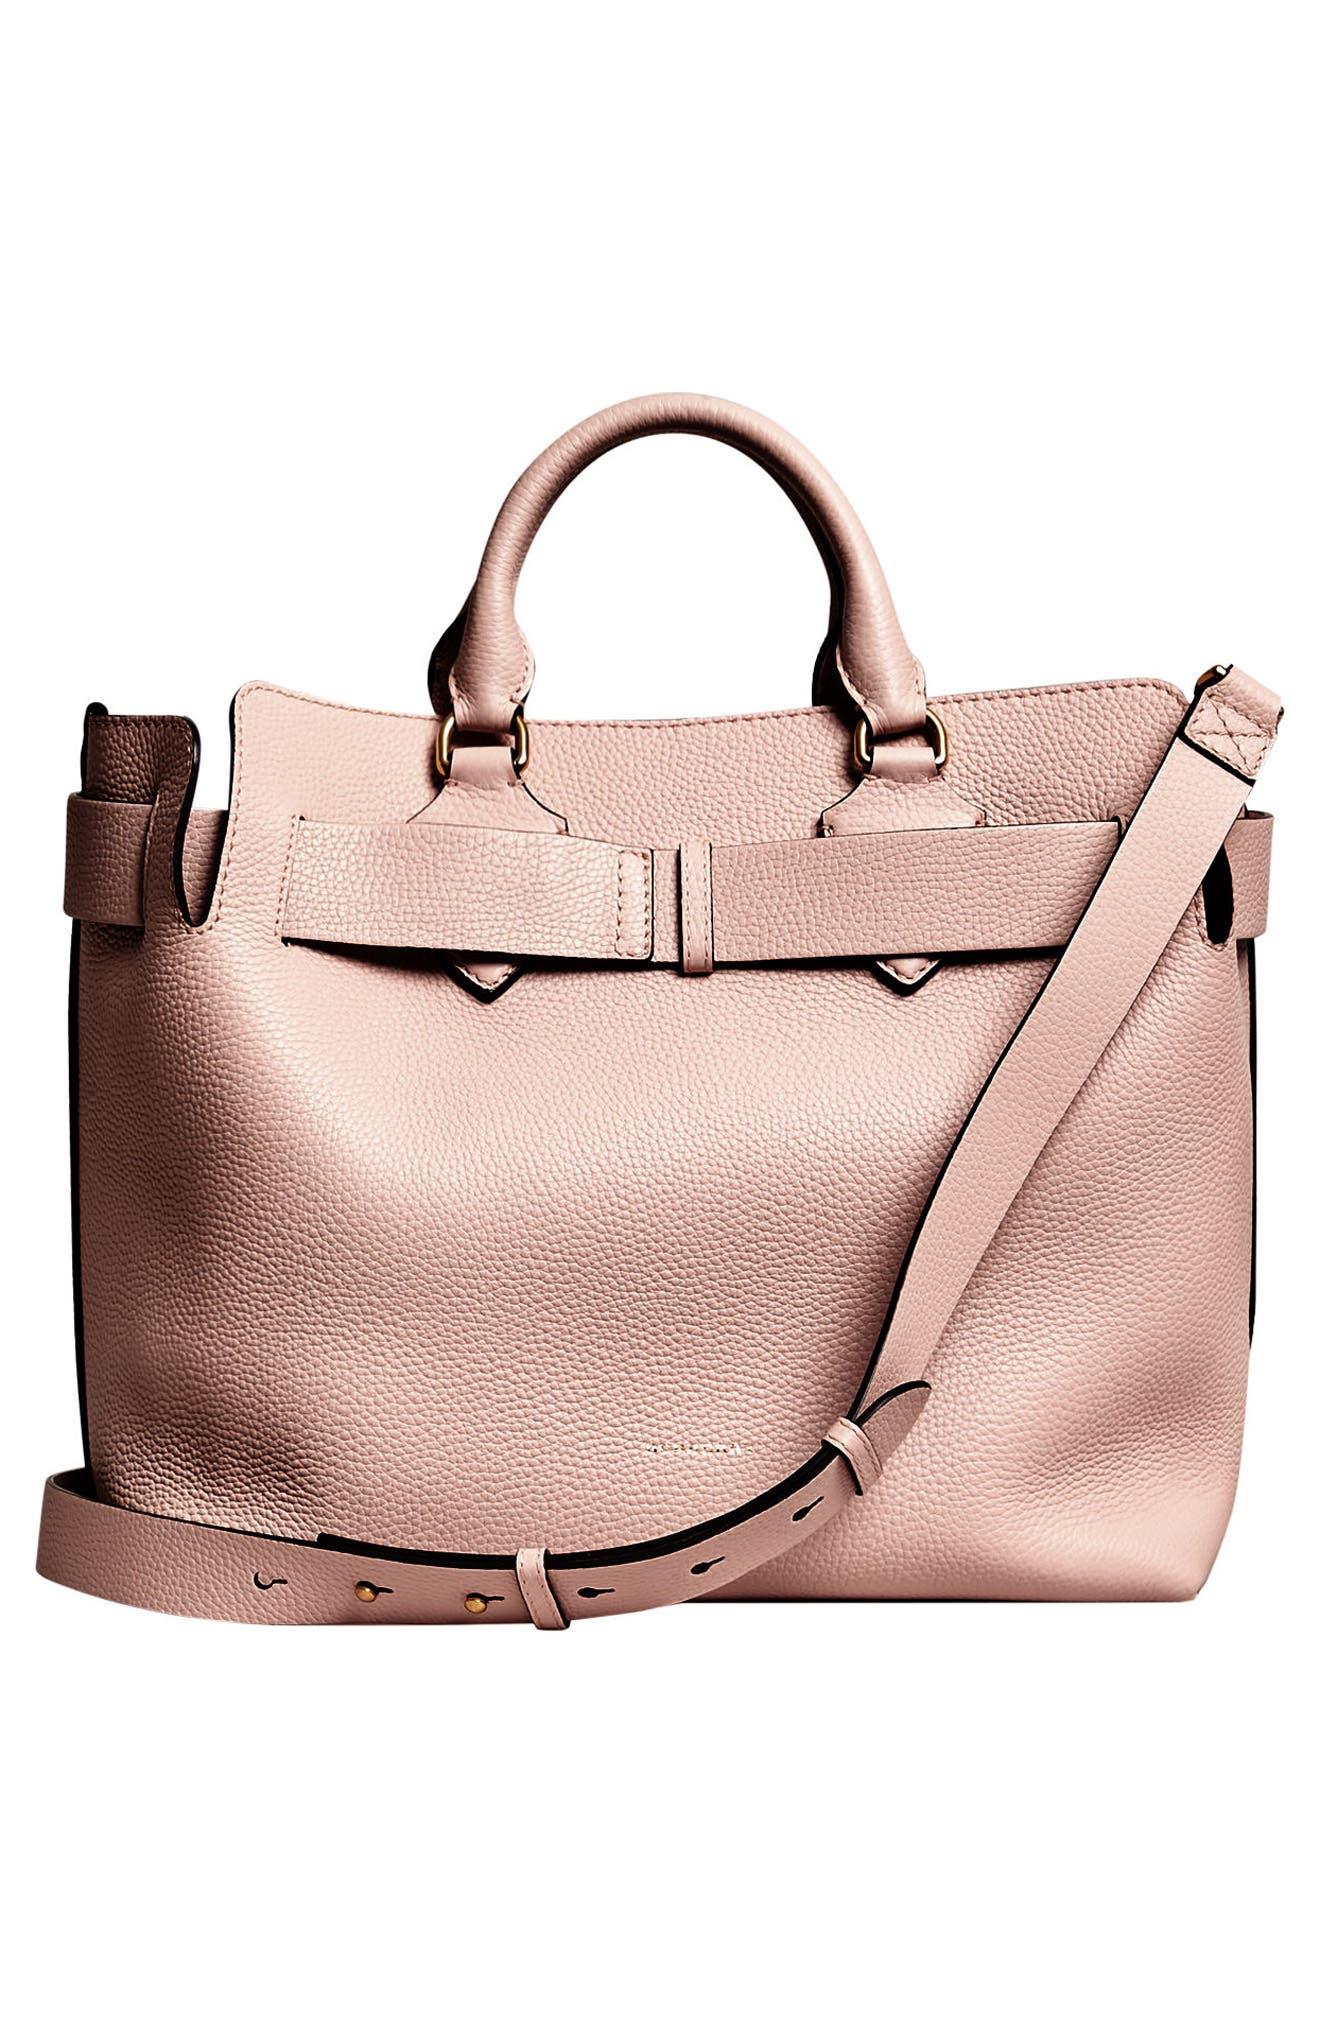 Medium Belt Bag Leather Tote,                             Alternate thumbnail 4, color,                             PALE ASH ROSE